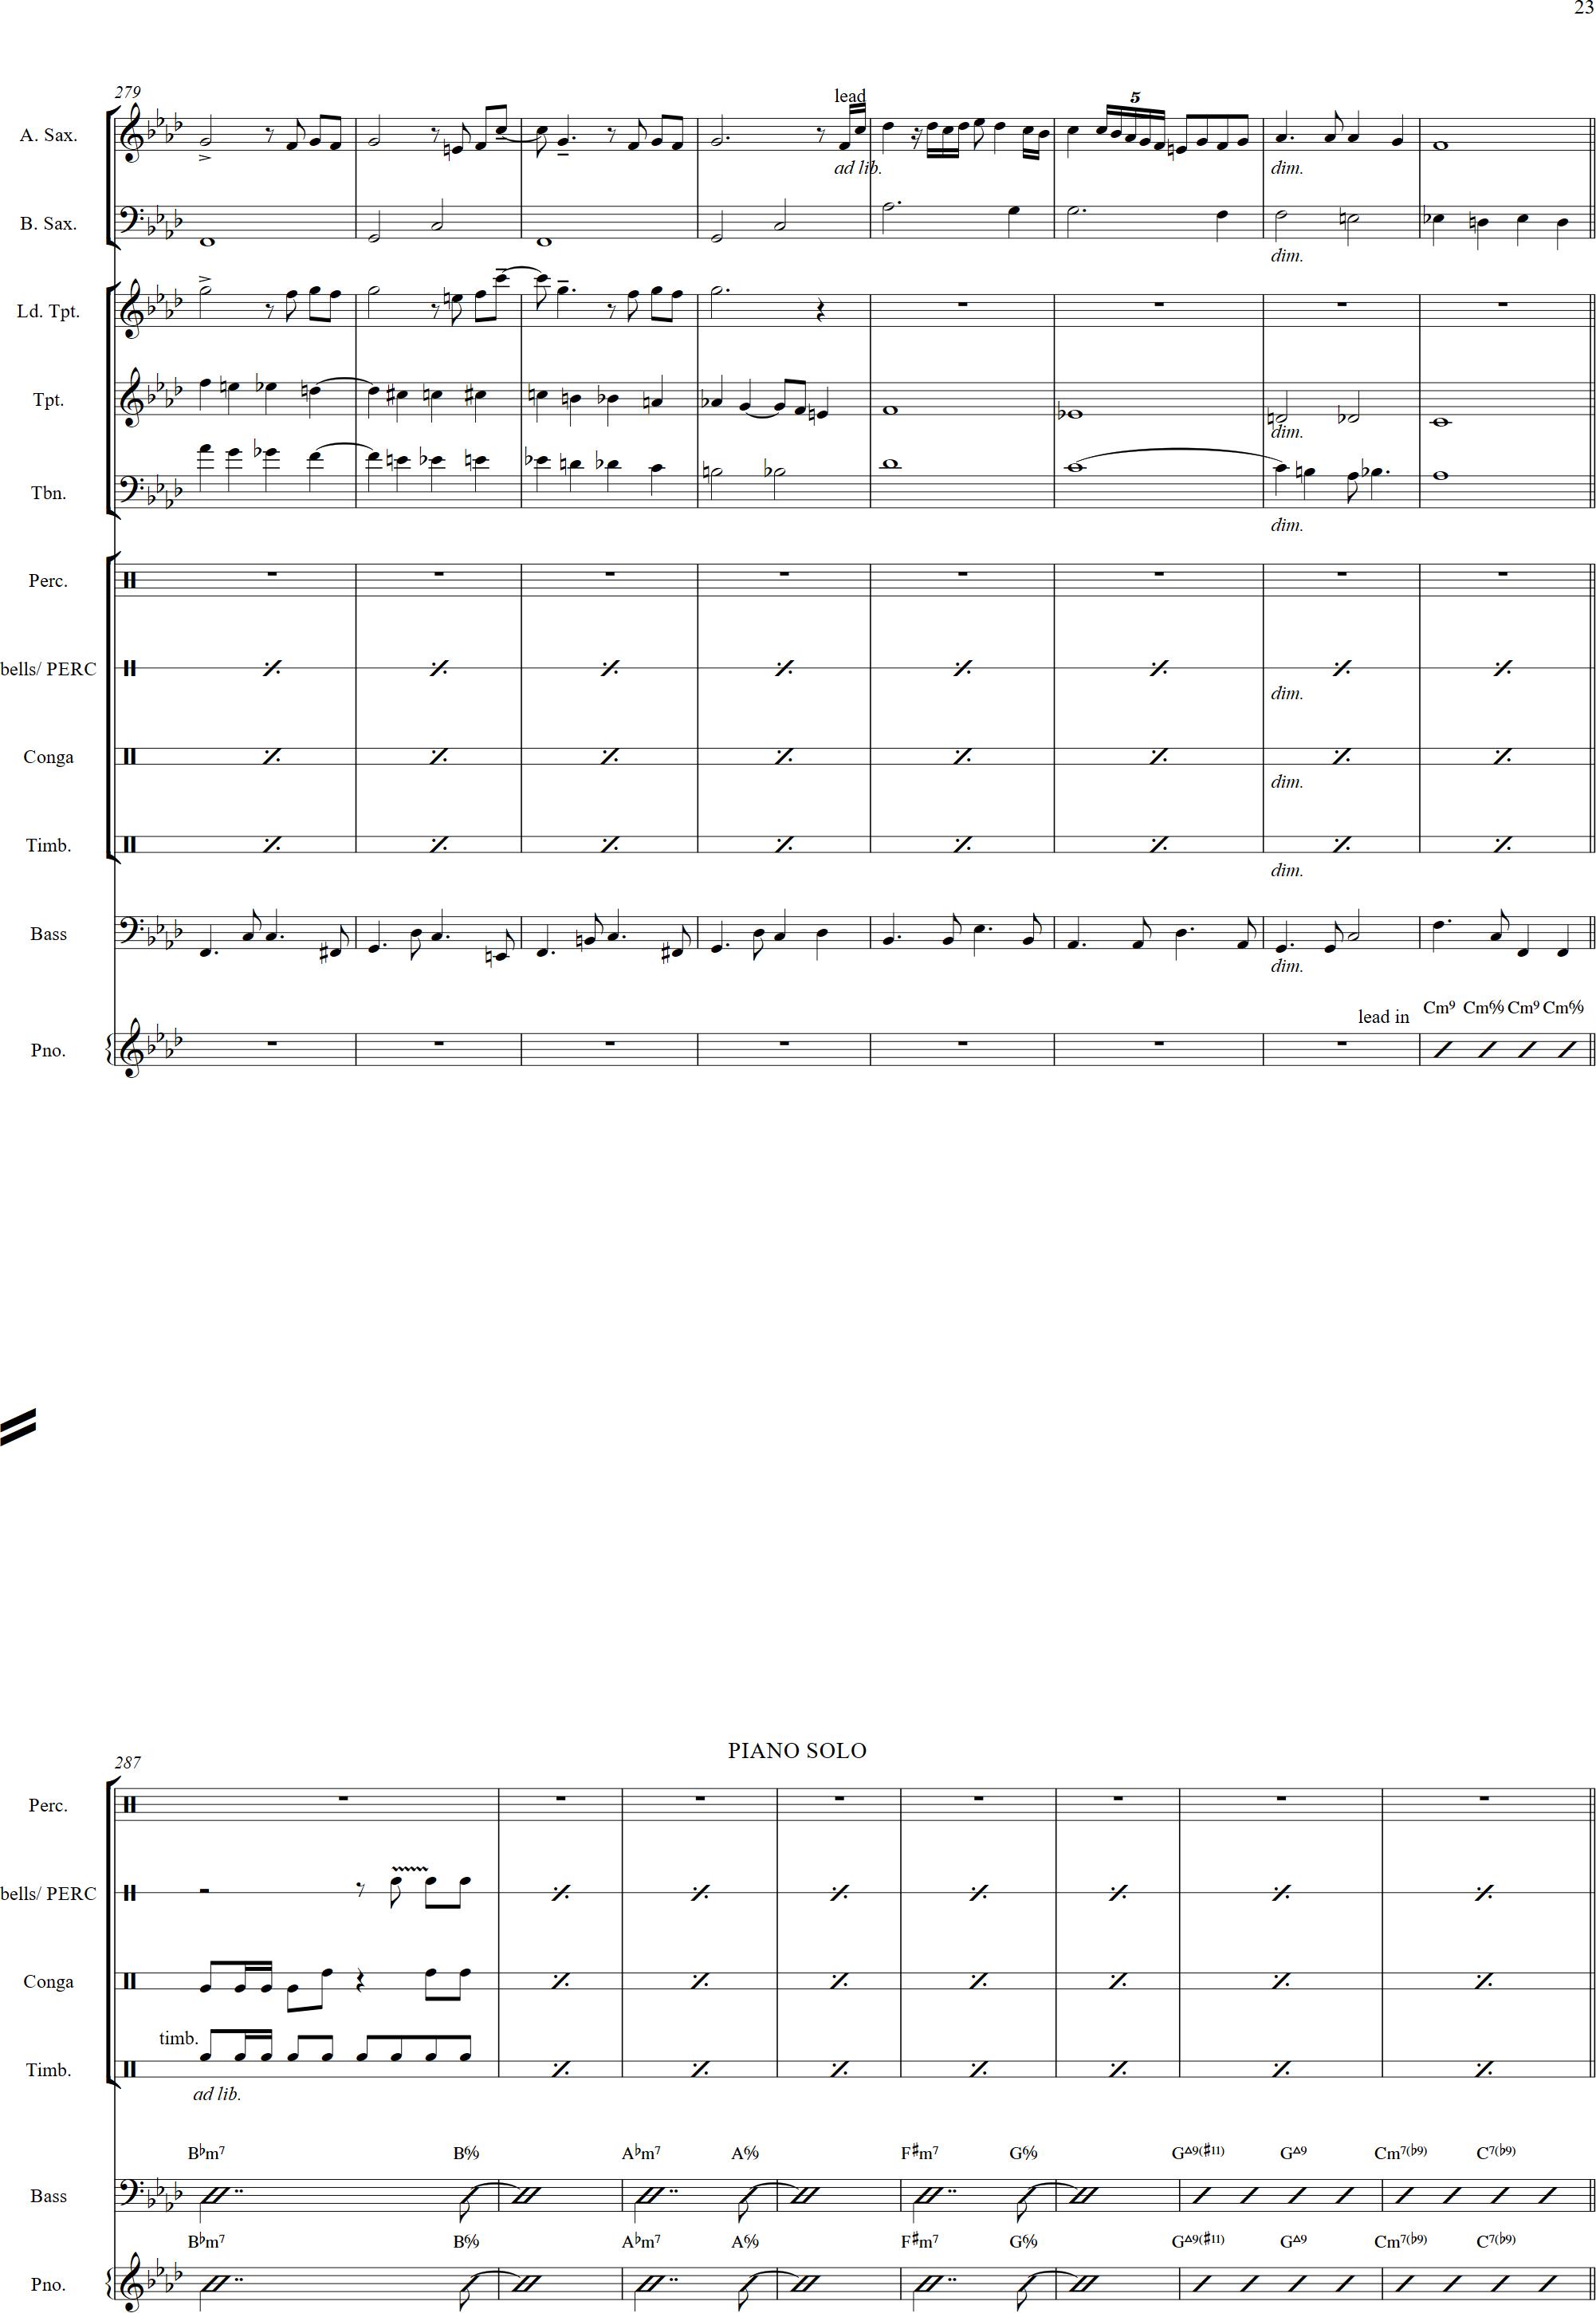 rumba riff new_0023.png